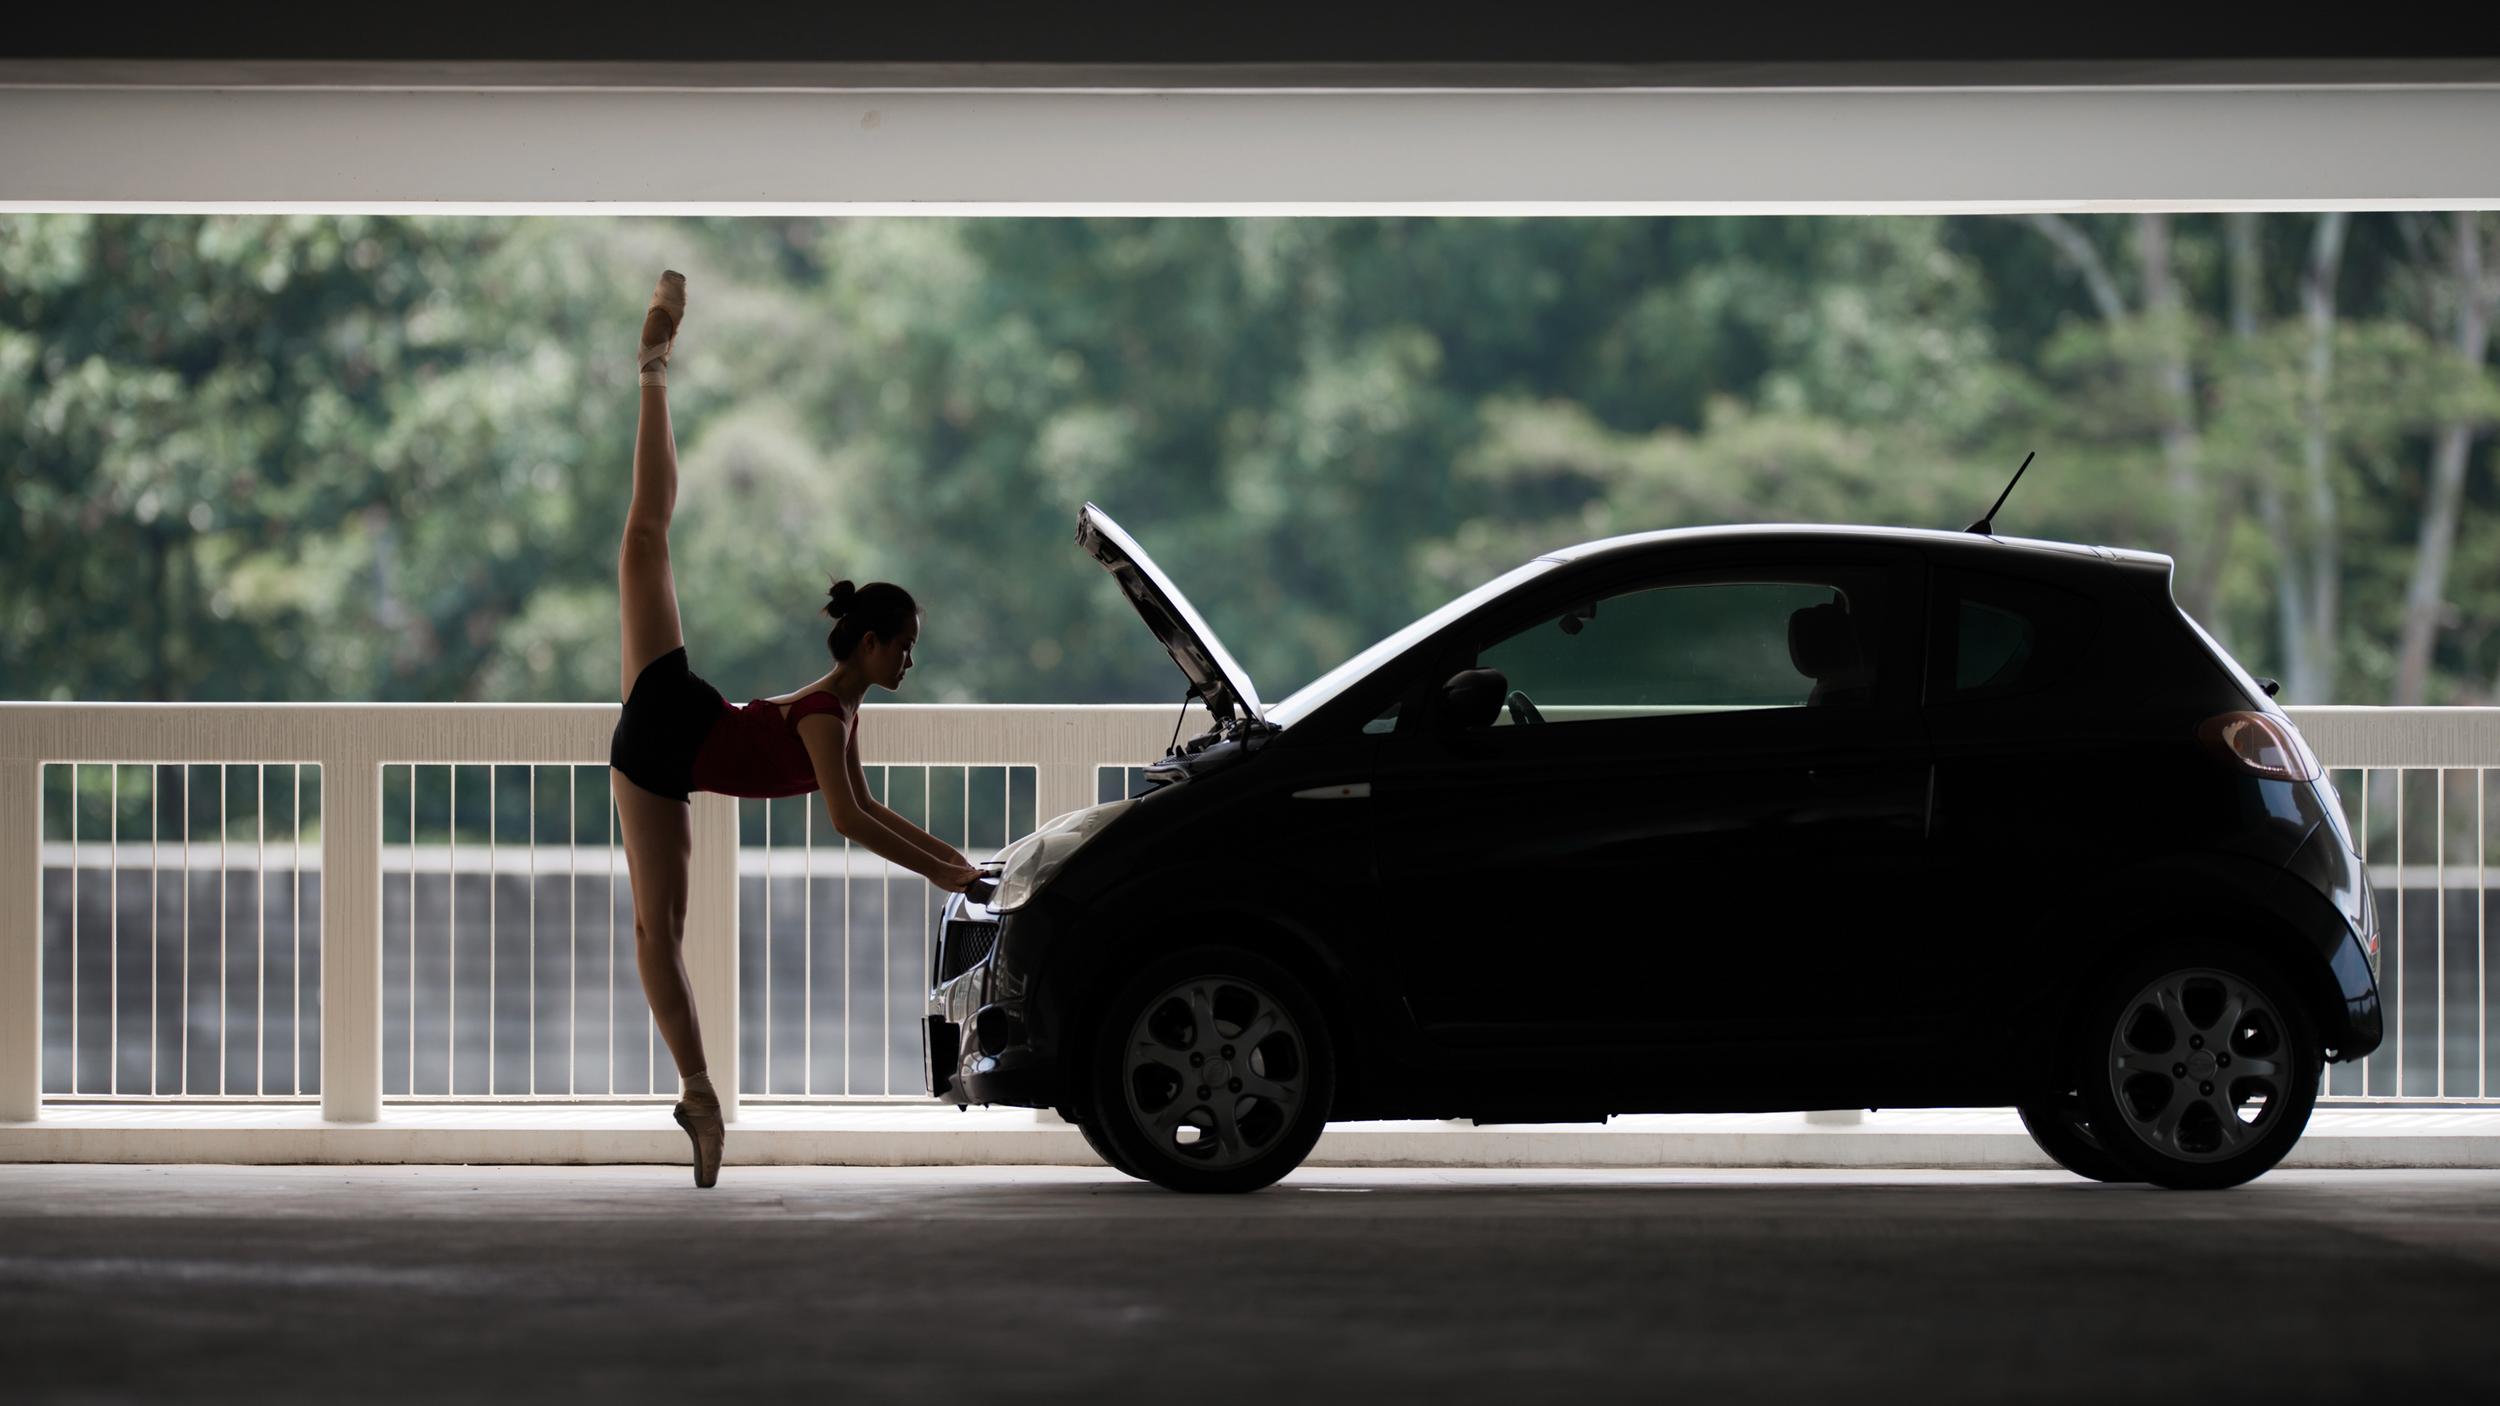 Leane in a car park